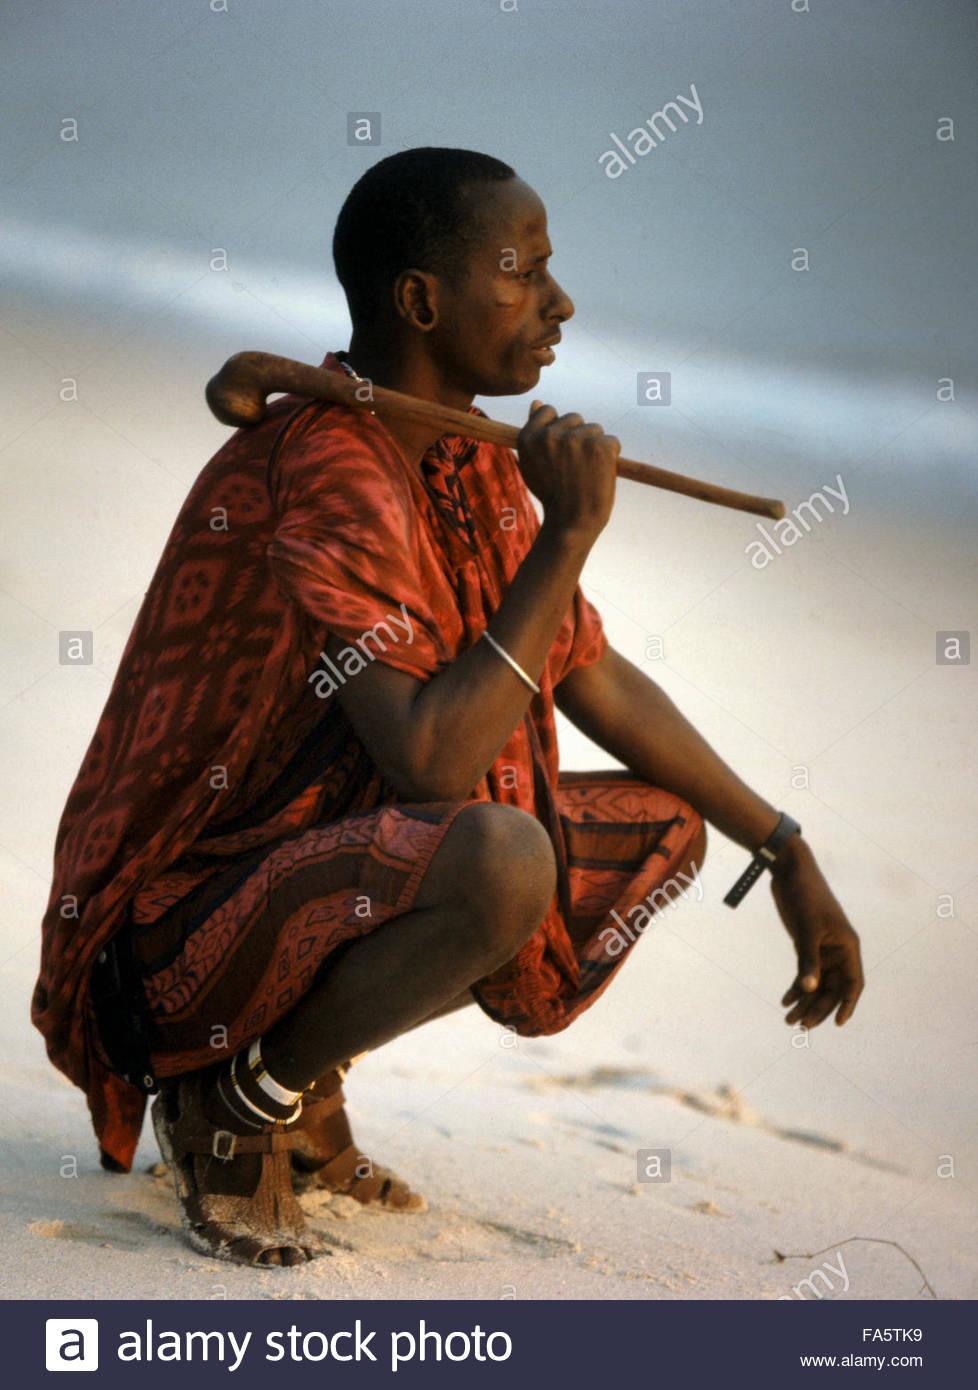 Masai Warrior With Rungu Weapon - Tanzania Africa 2000 Stock Photo